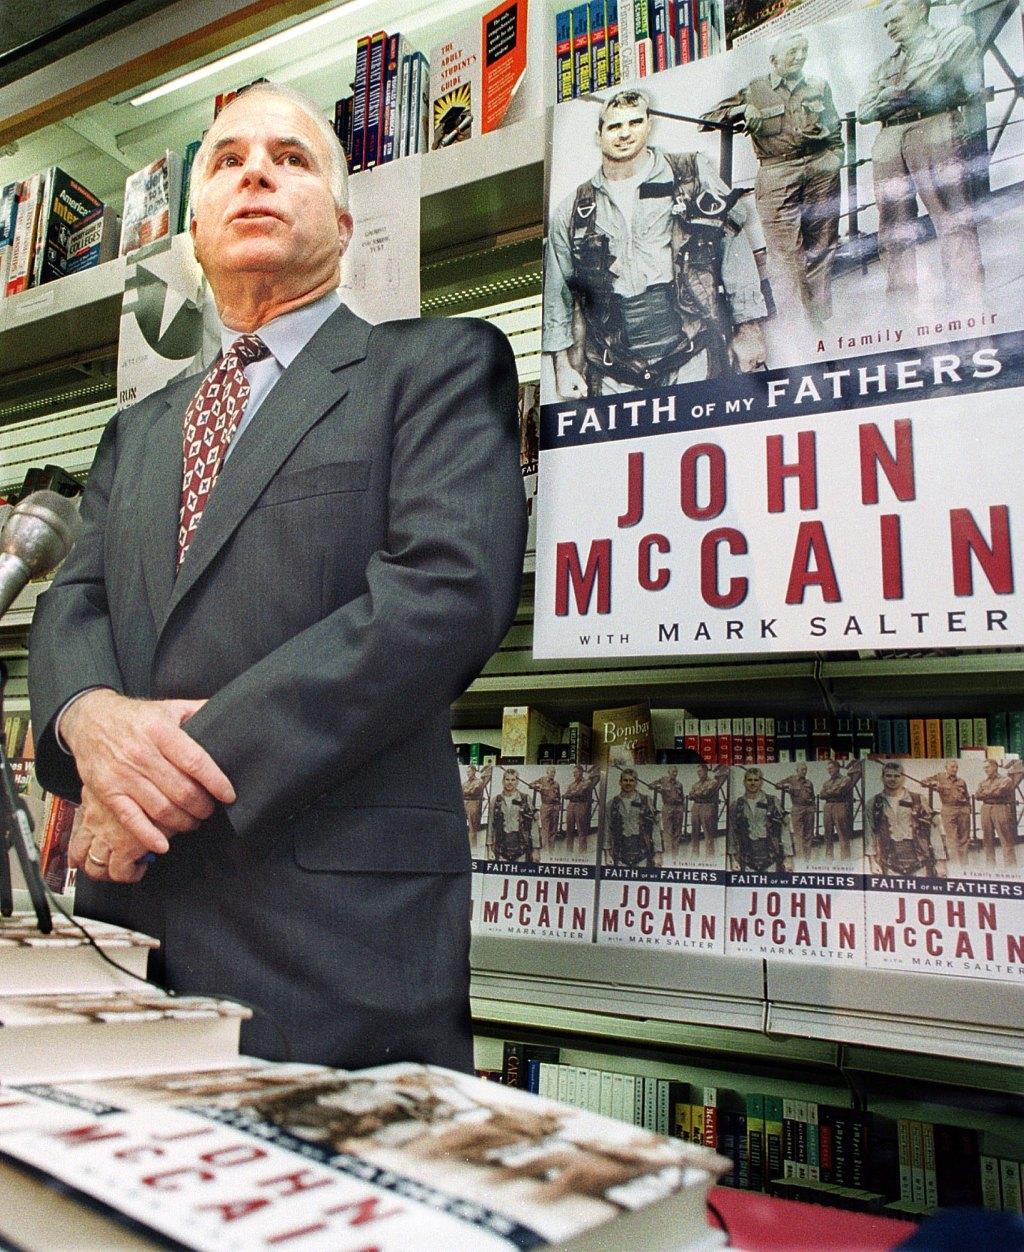 Republican presidential hopeful Sen. John McCain, R-Ariz., speaks to the media before a book signing in Washington, D.C., September 13, 1999.